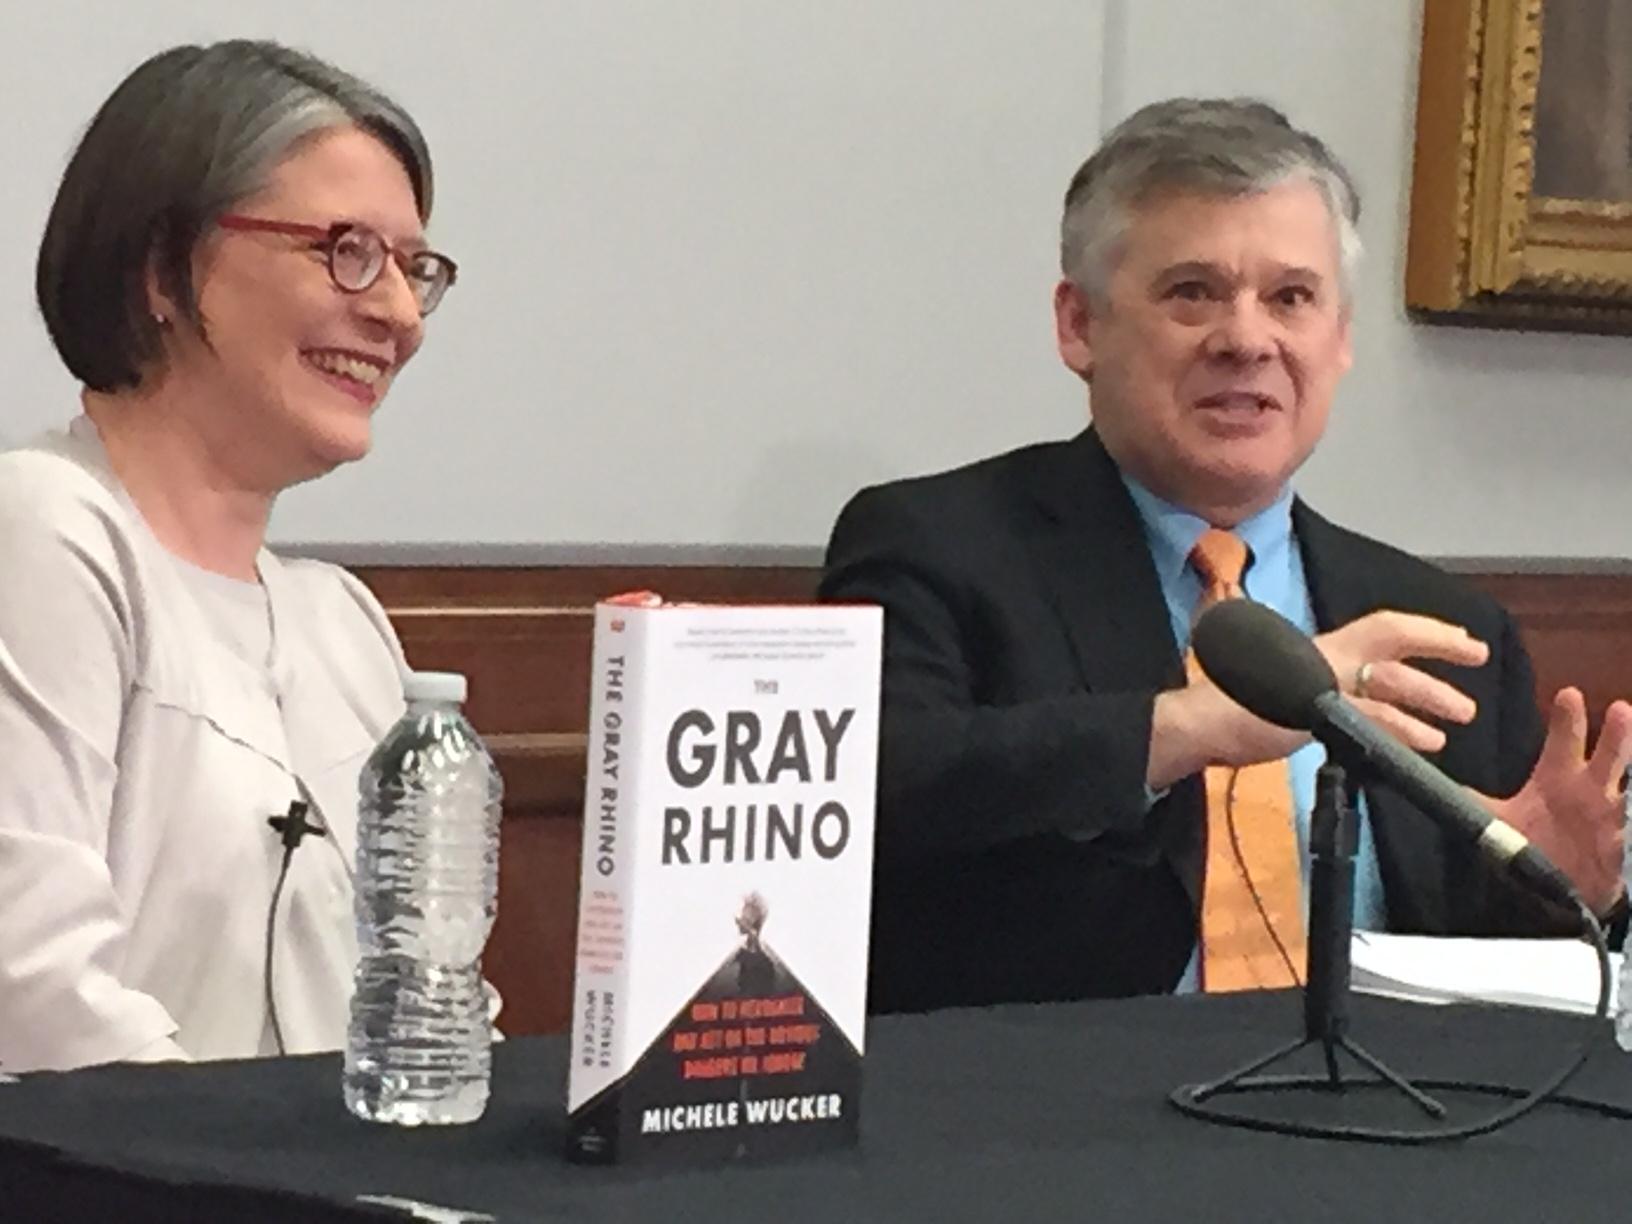 Gray Rhino with Michele Wucker